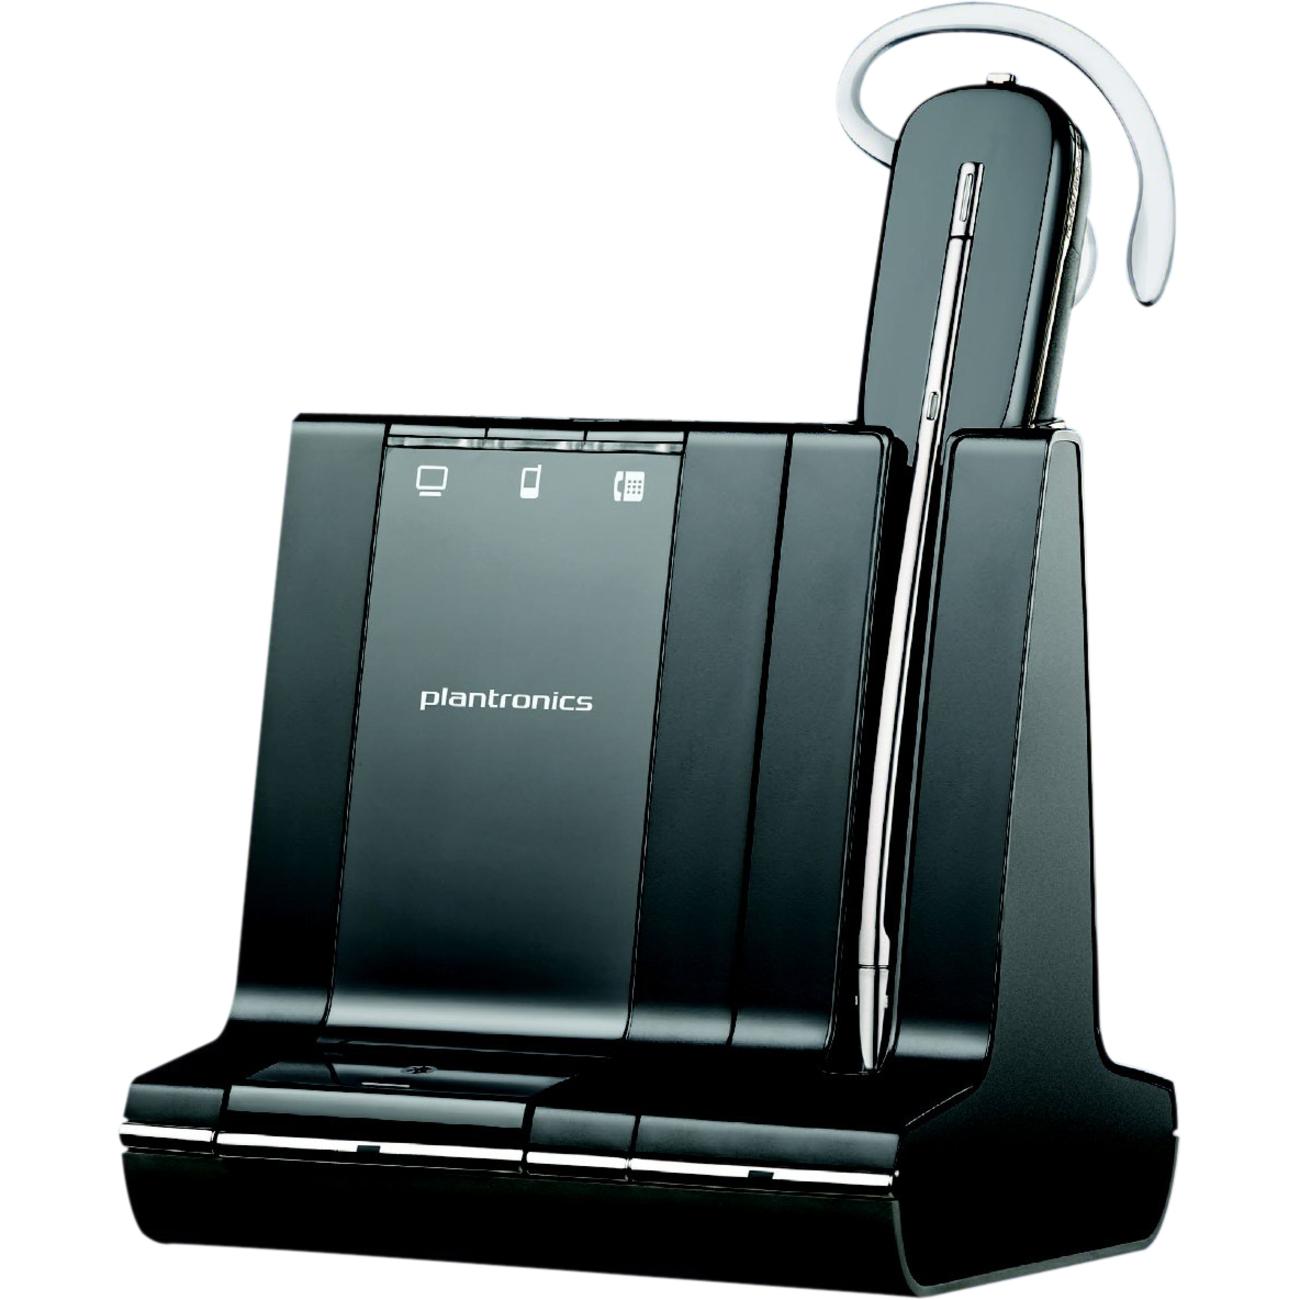 Plantronics Savi W745-M Headset_subImage_1